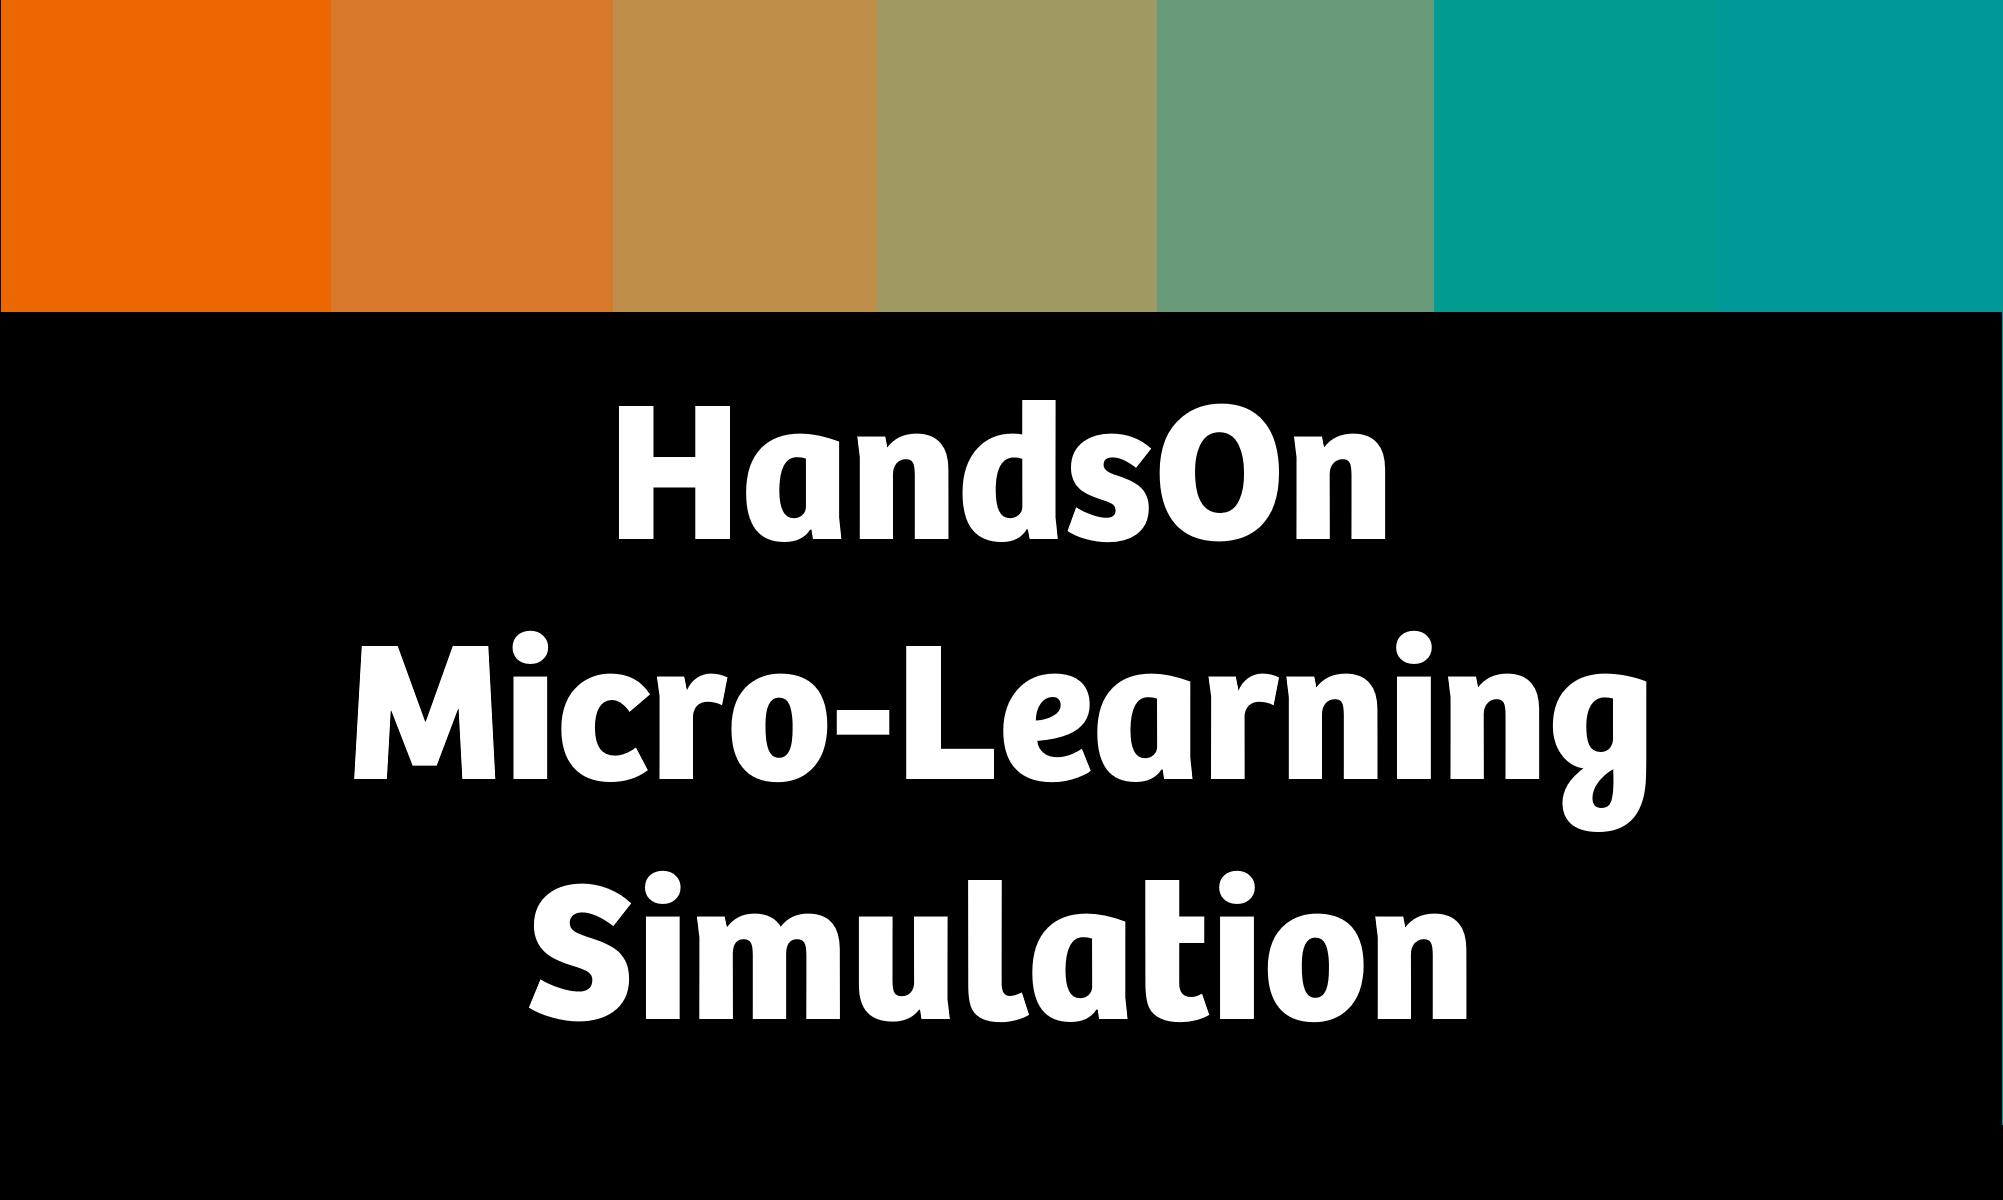 HandsOn Micro-Learning Simulation